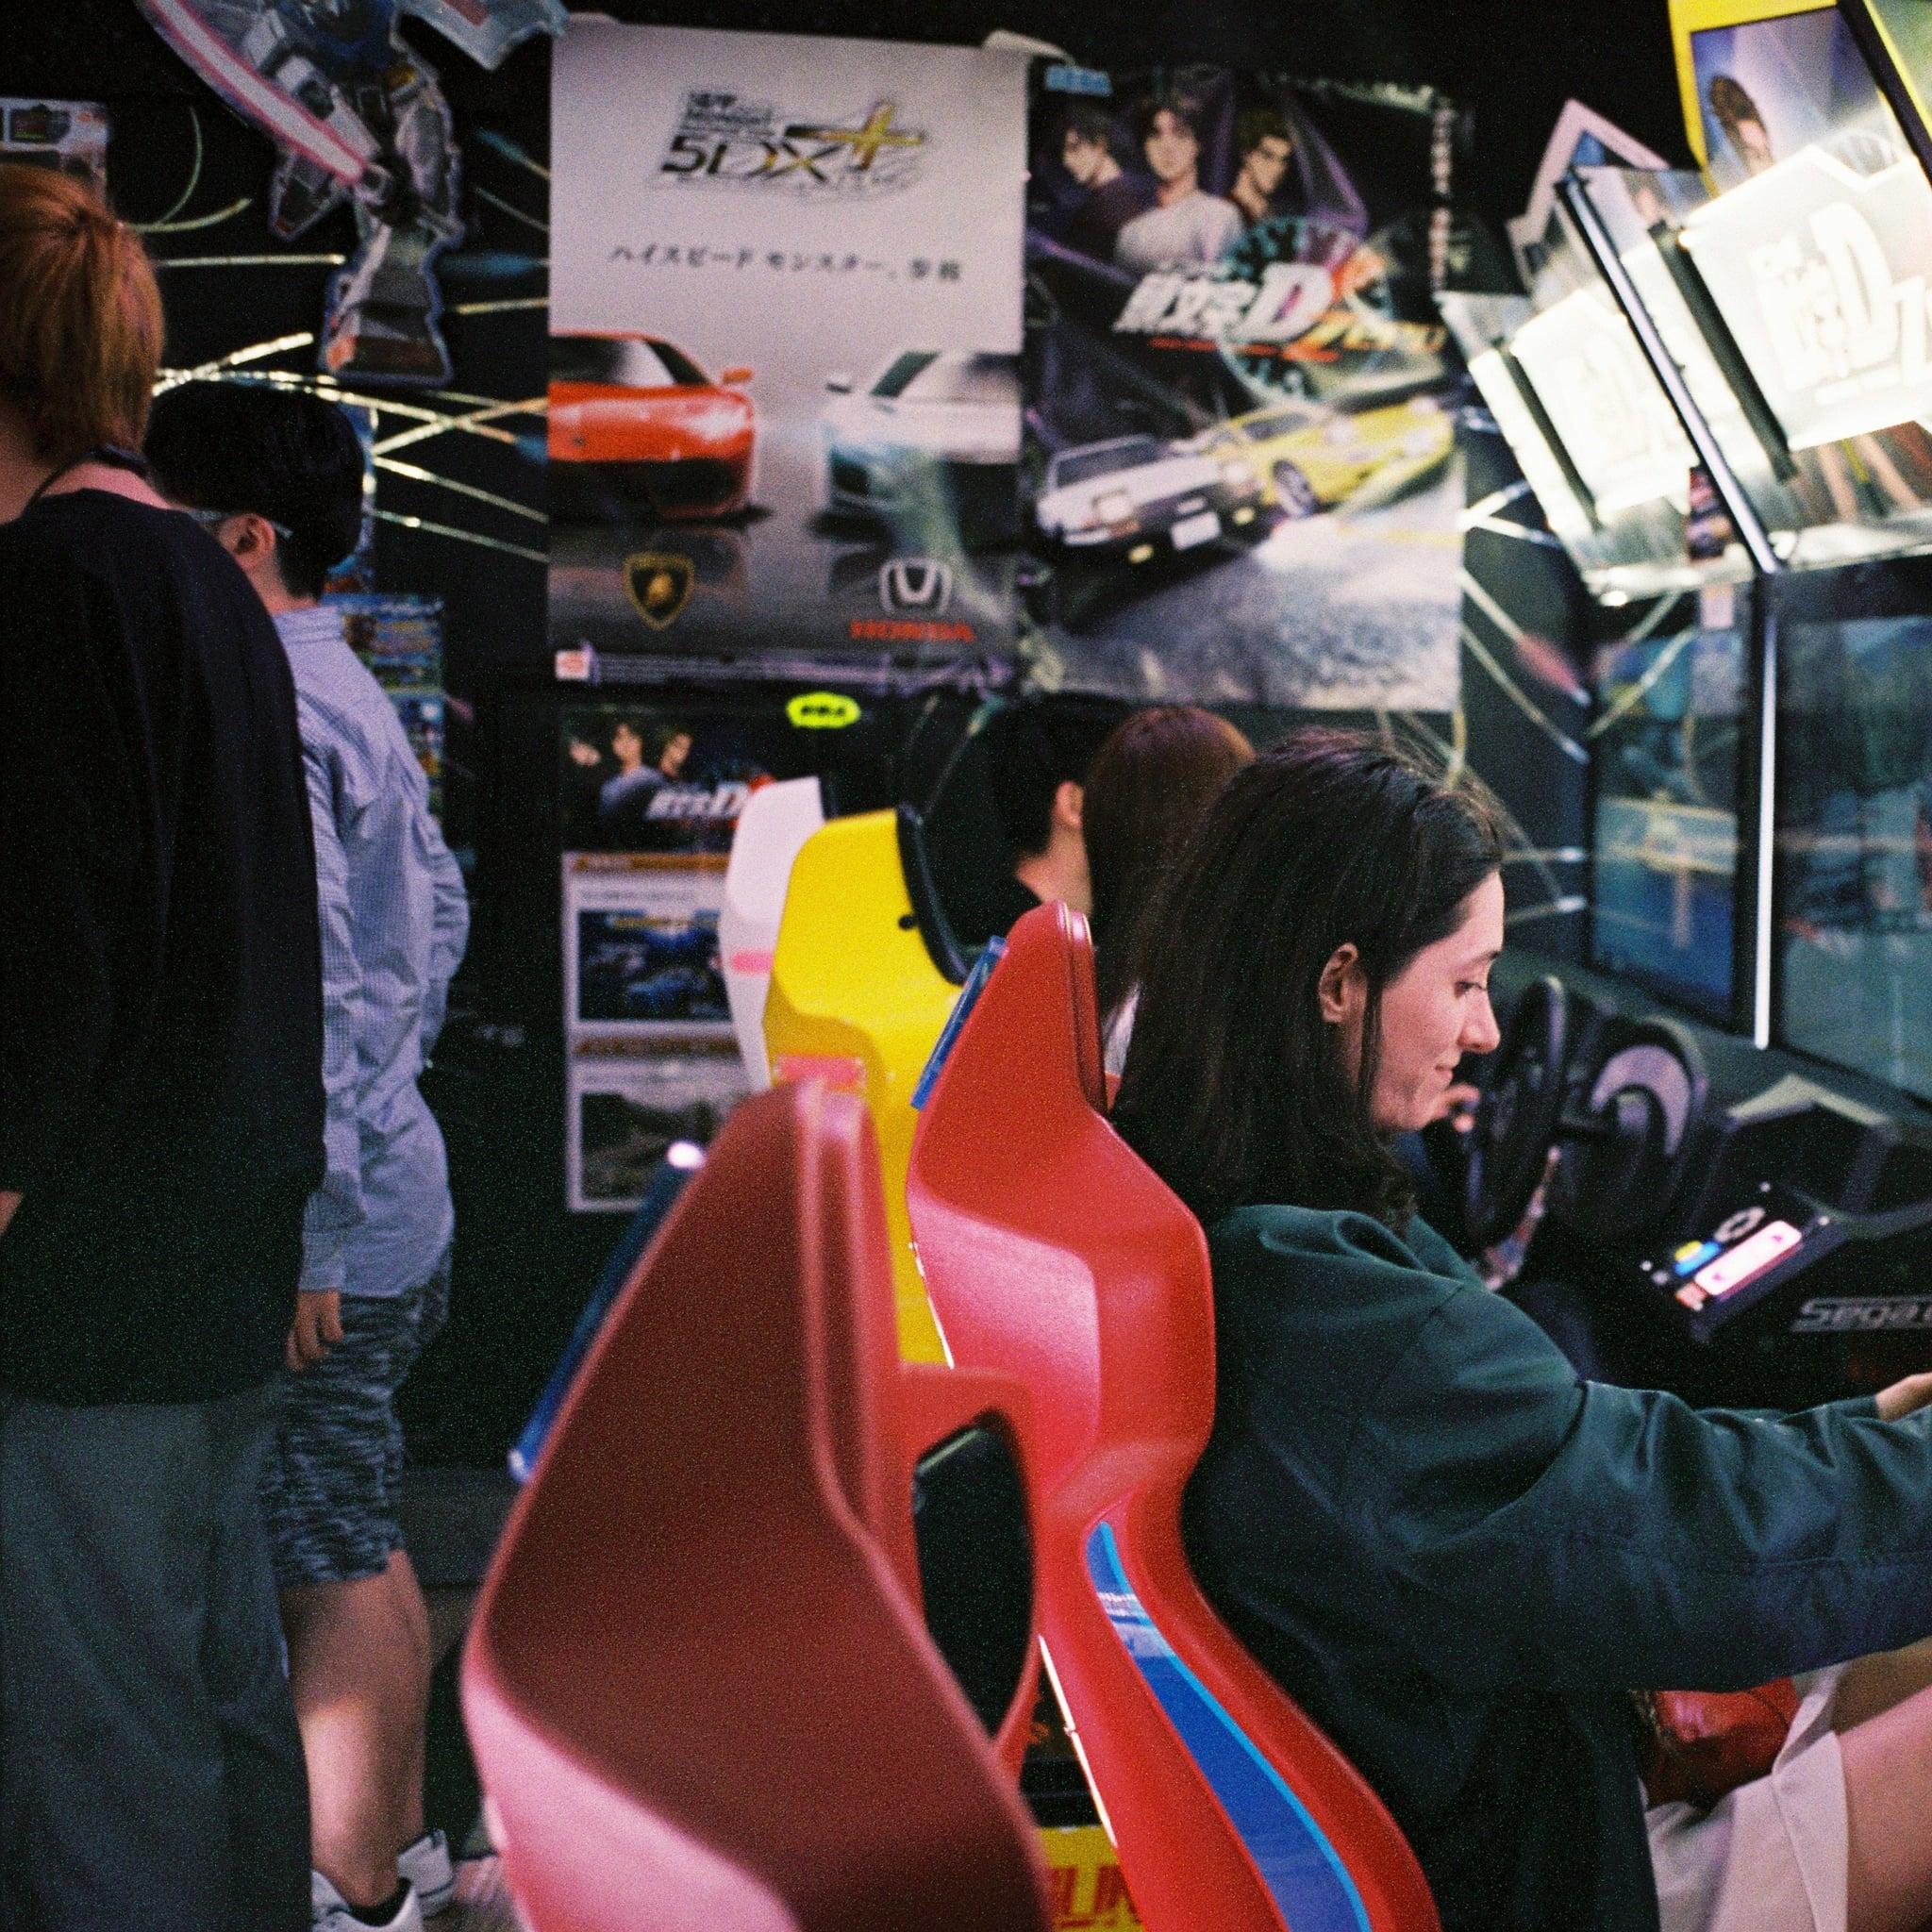 Arcade 1 Up Machines From Walmart | POPSUGAR Family